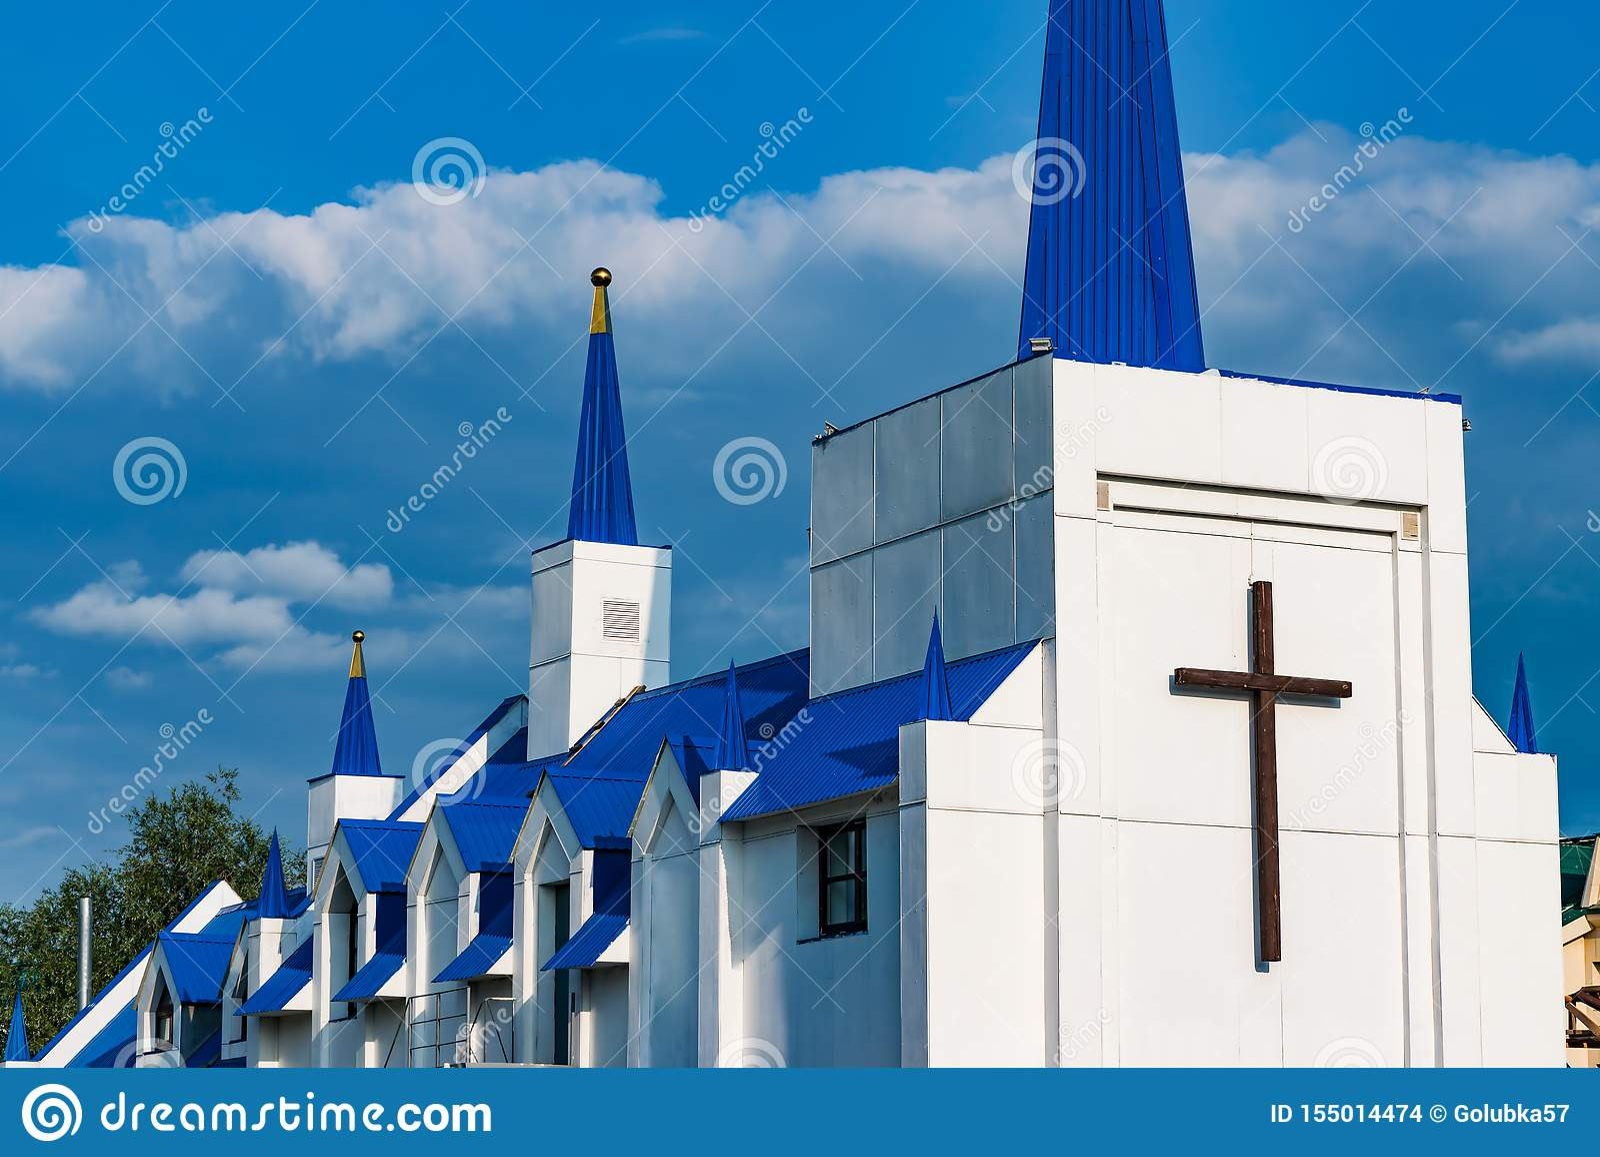 Una piccola moschea musulmana bianca e blu moderna nella città contro un cielo blu